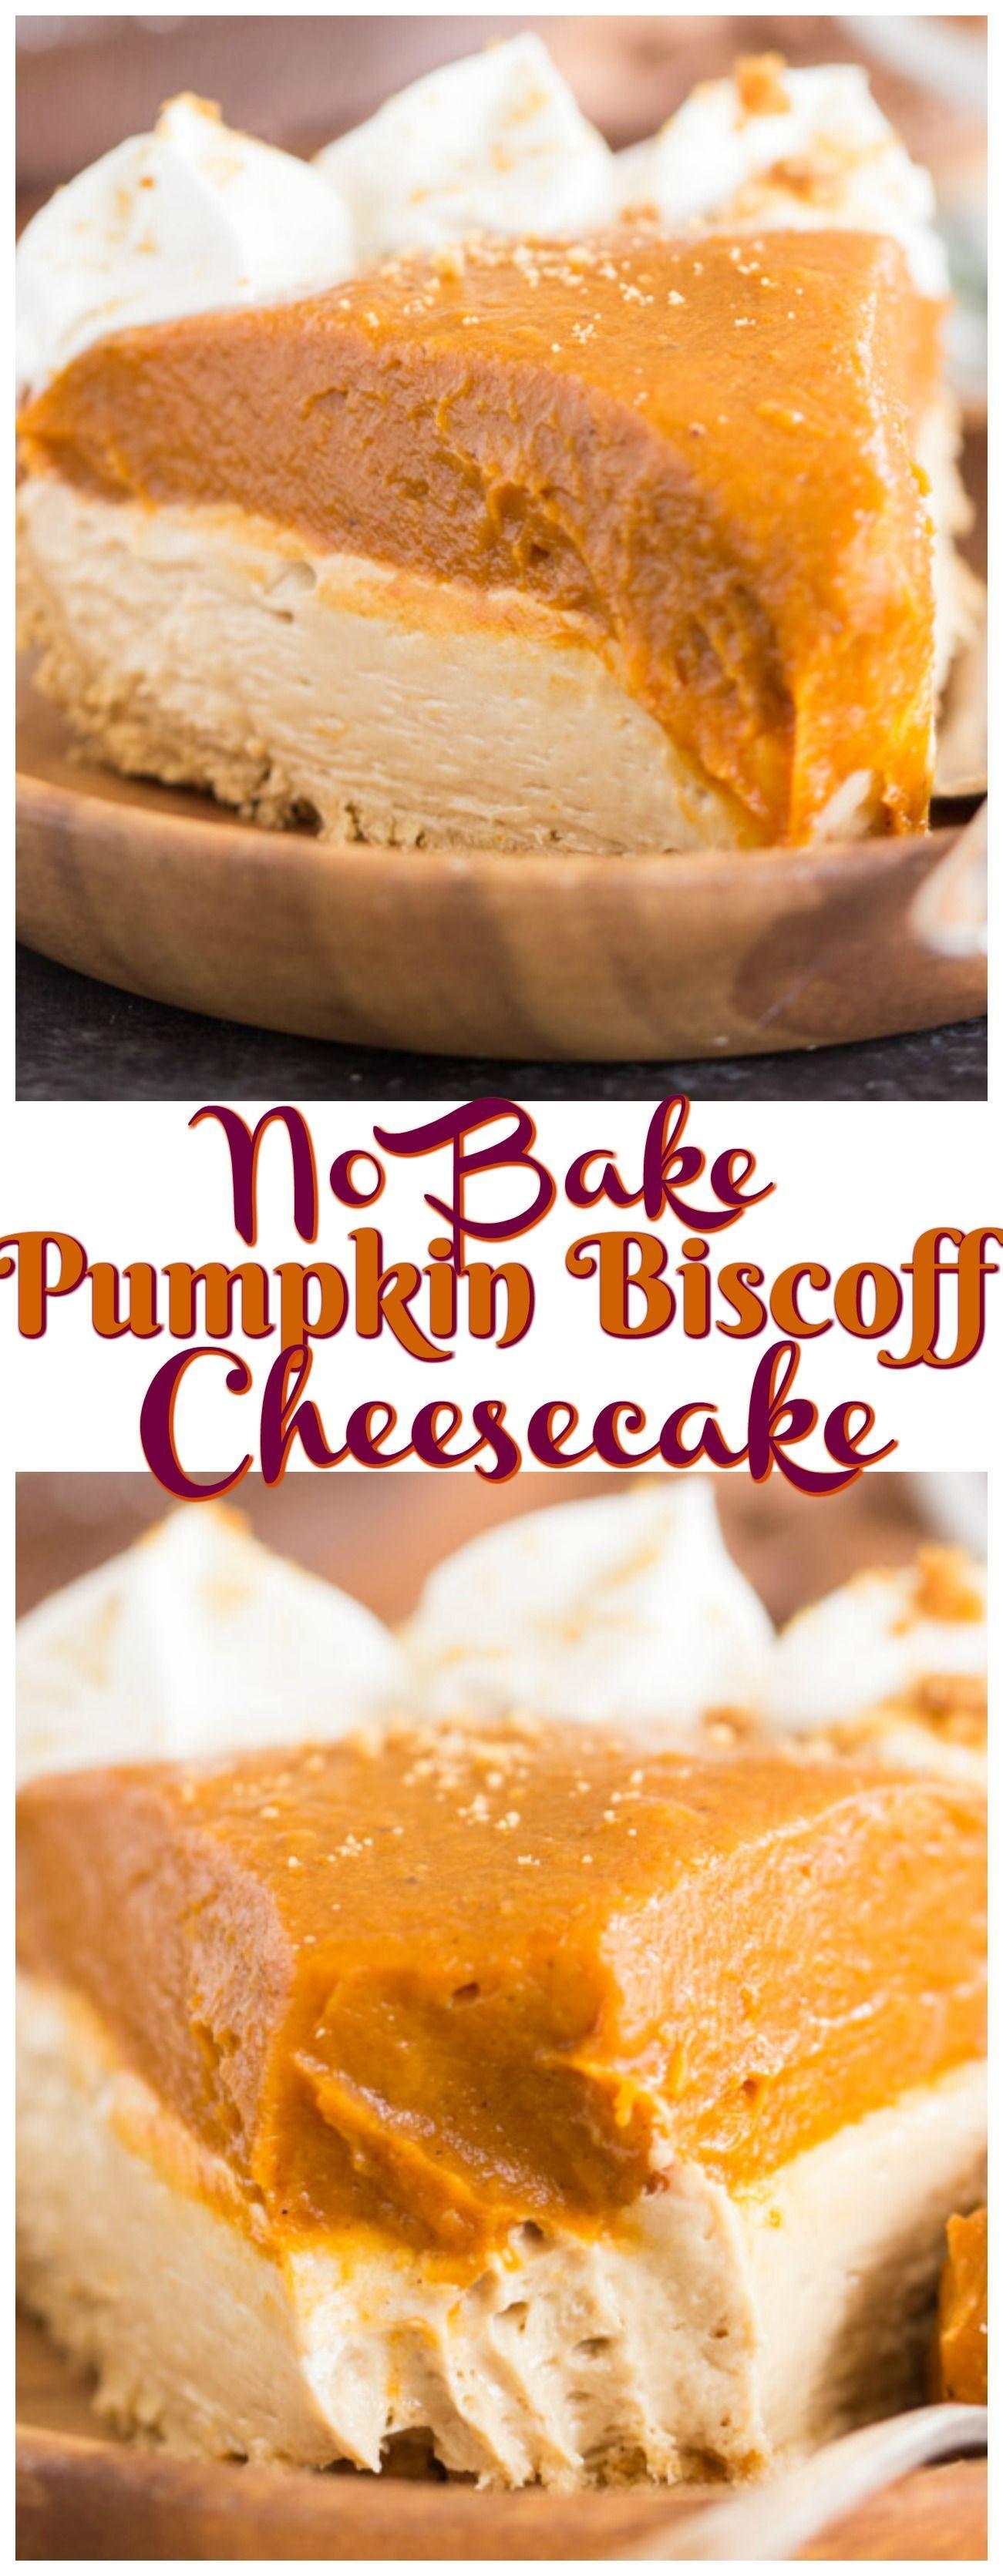 No bake double layer biscoff pumpkin cheesecake recipe